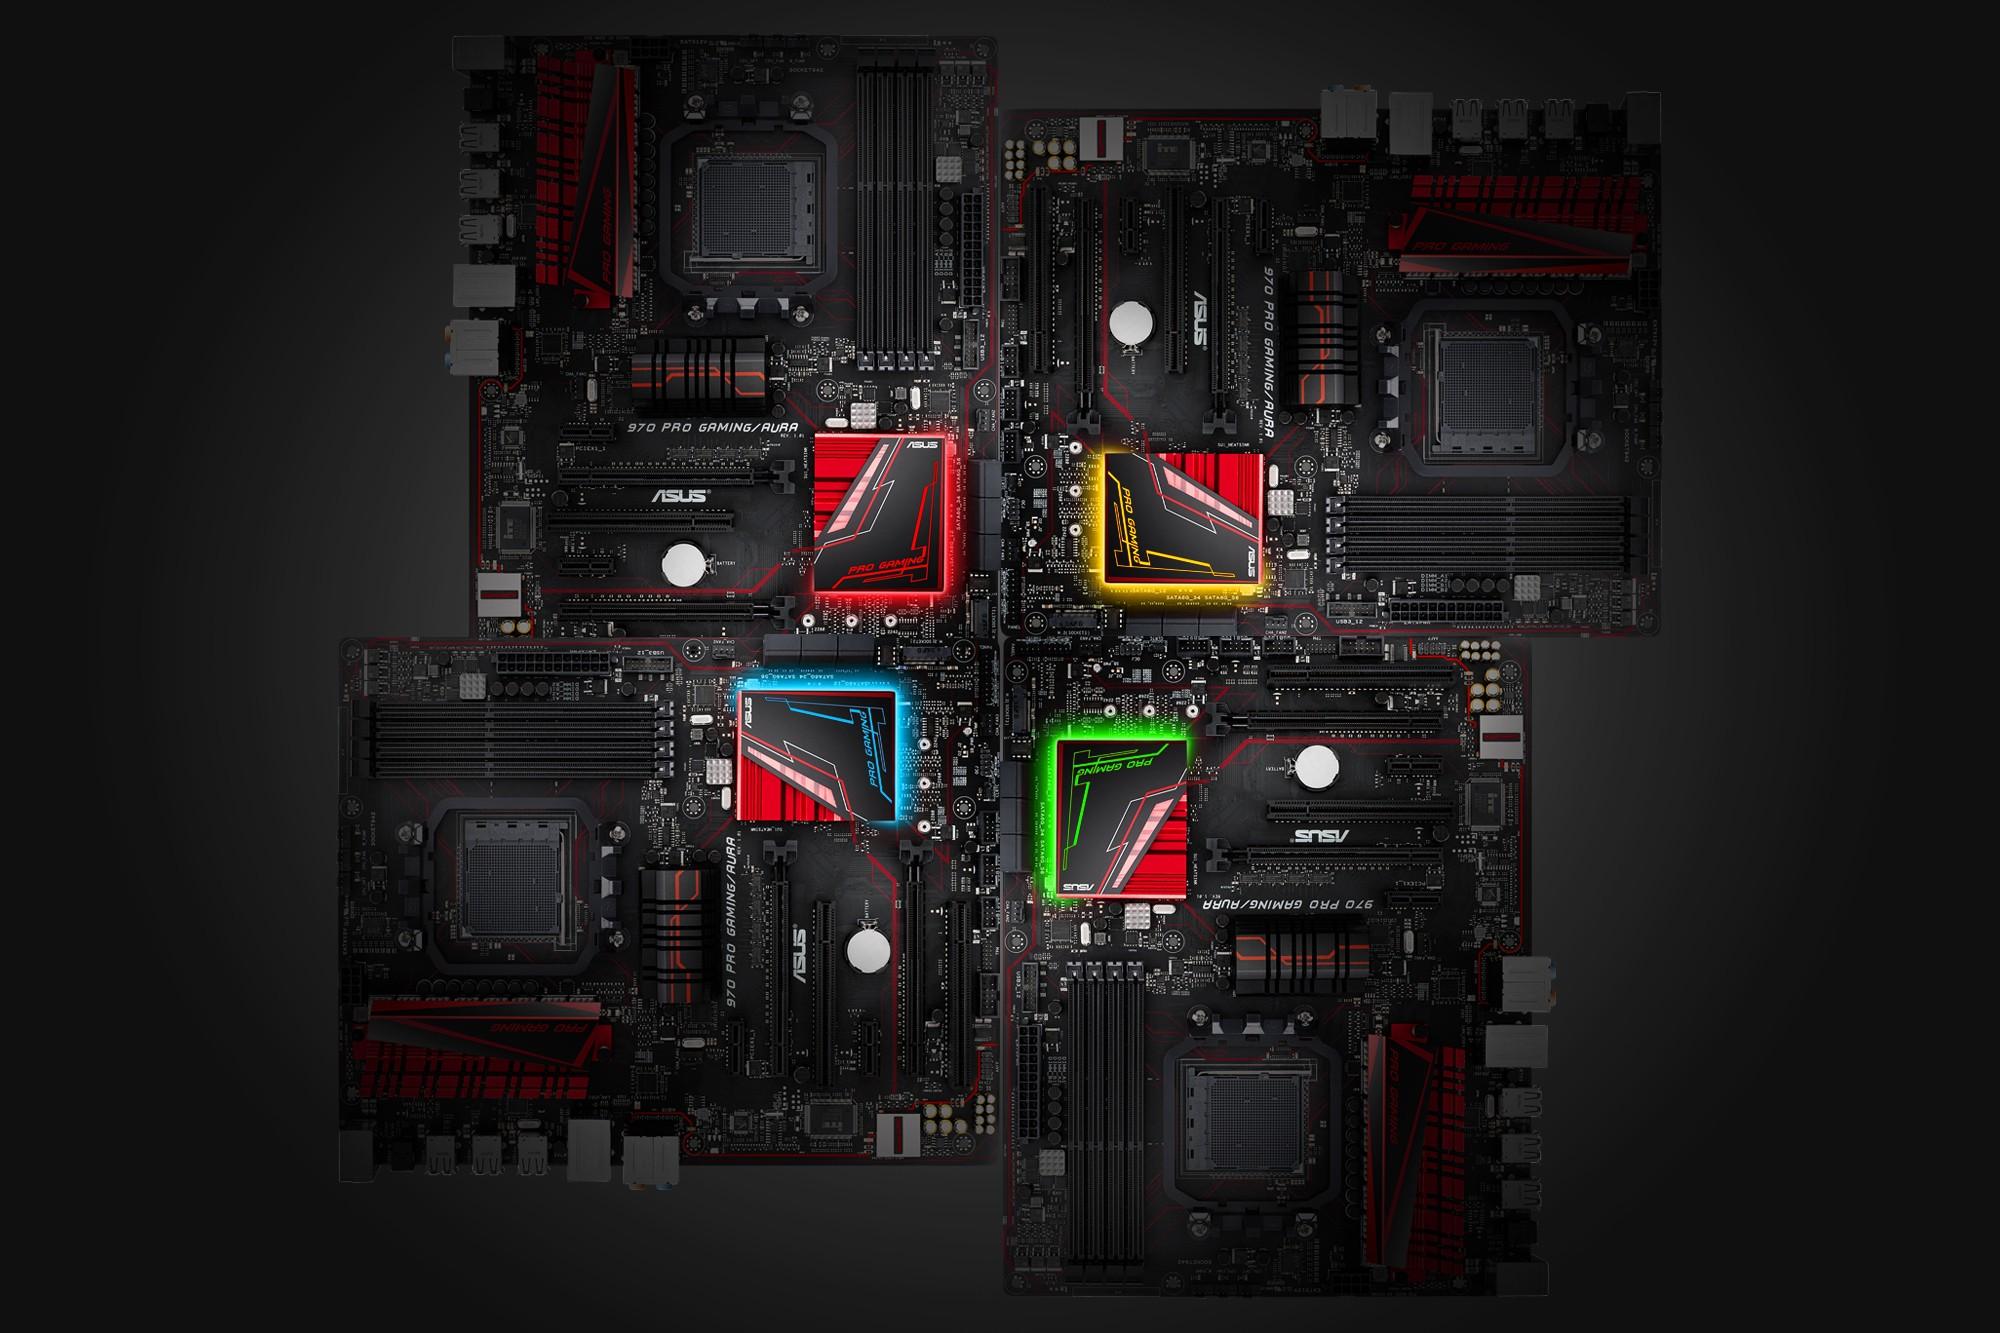 Asus представила новую игровую материнскую плату 970 Pro Gaming  Aura